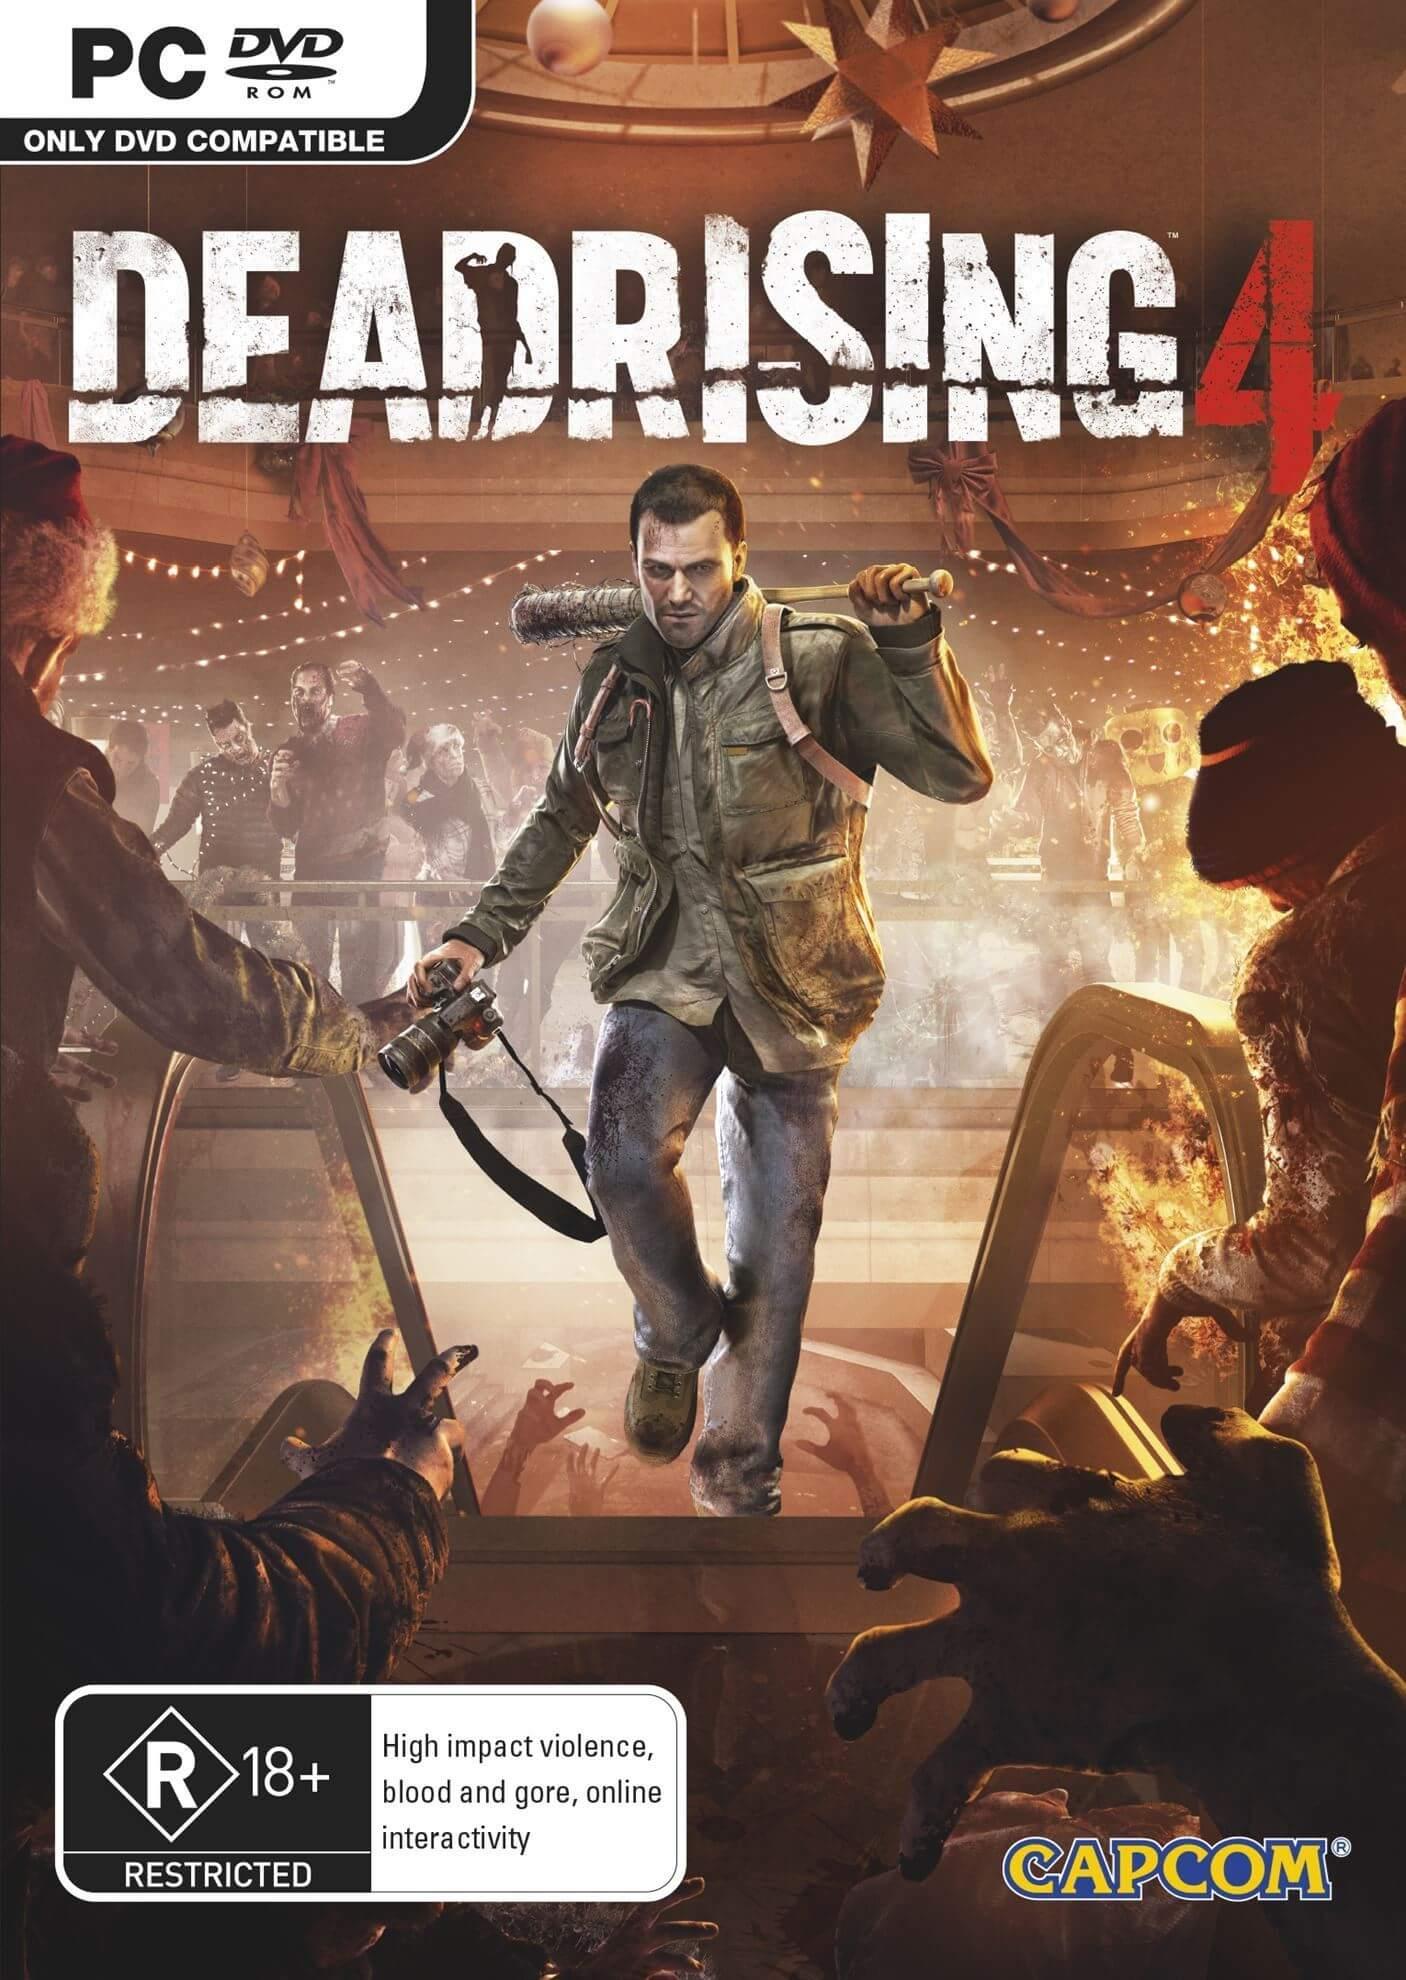 DEADRISING™ 4